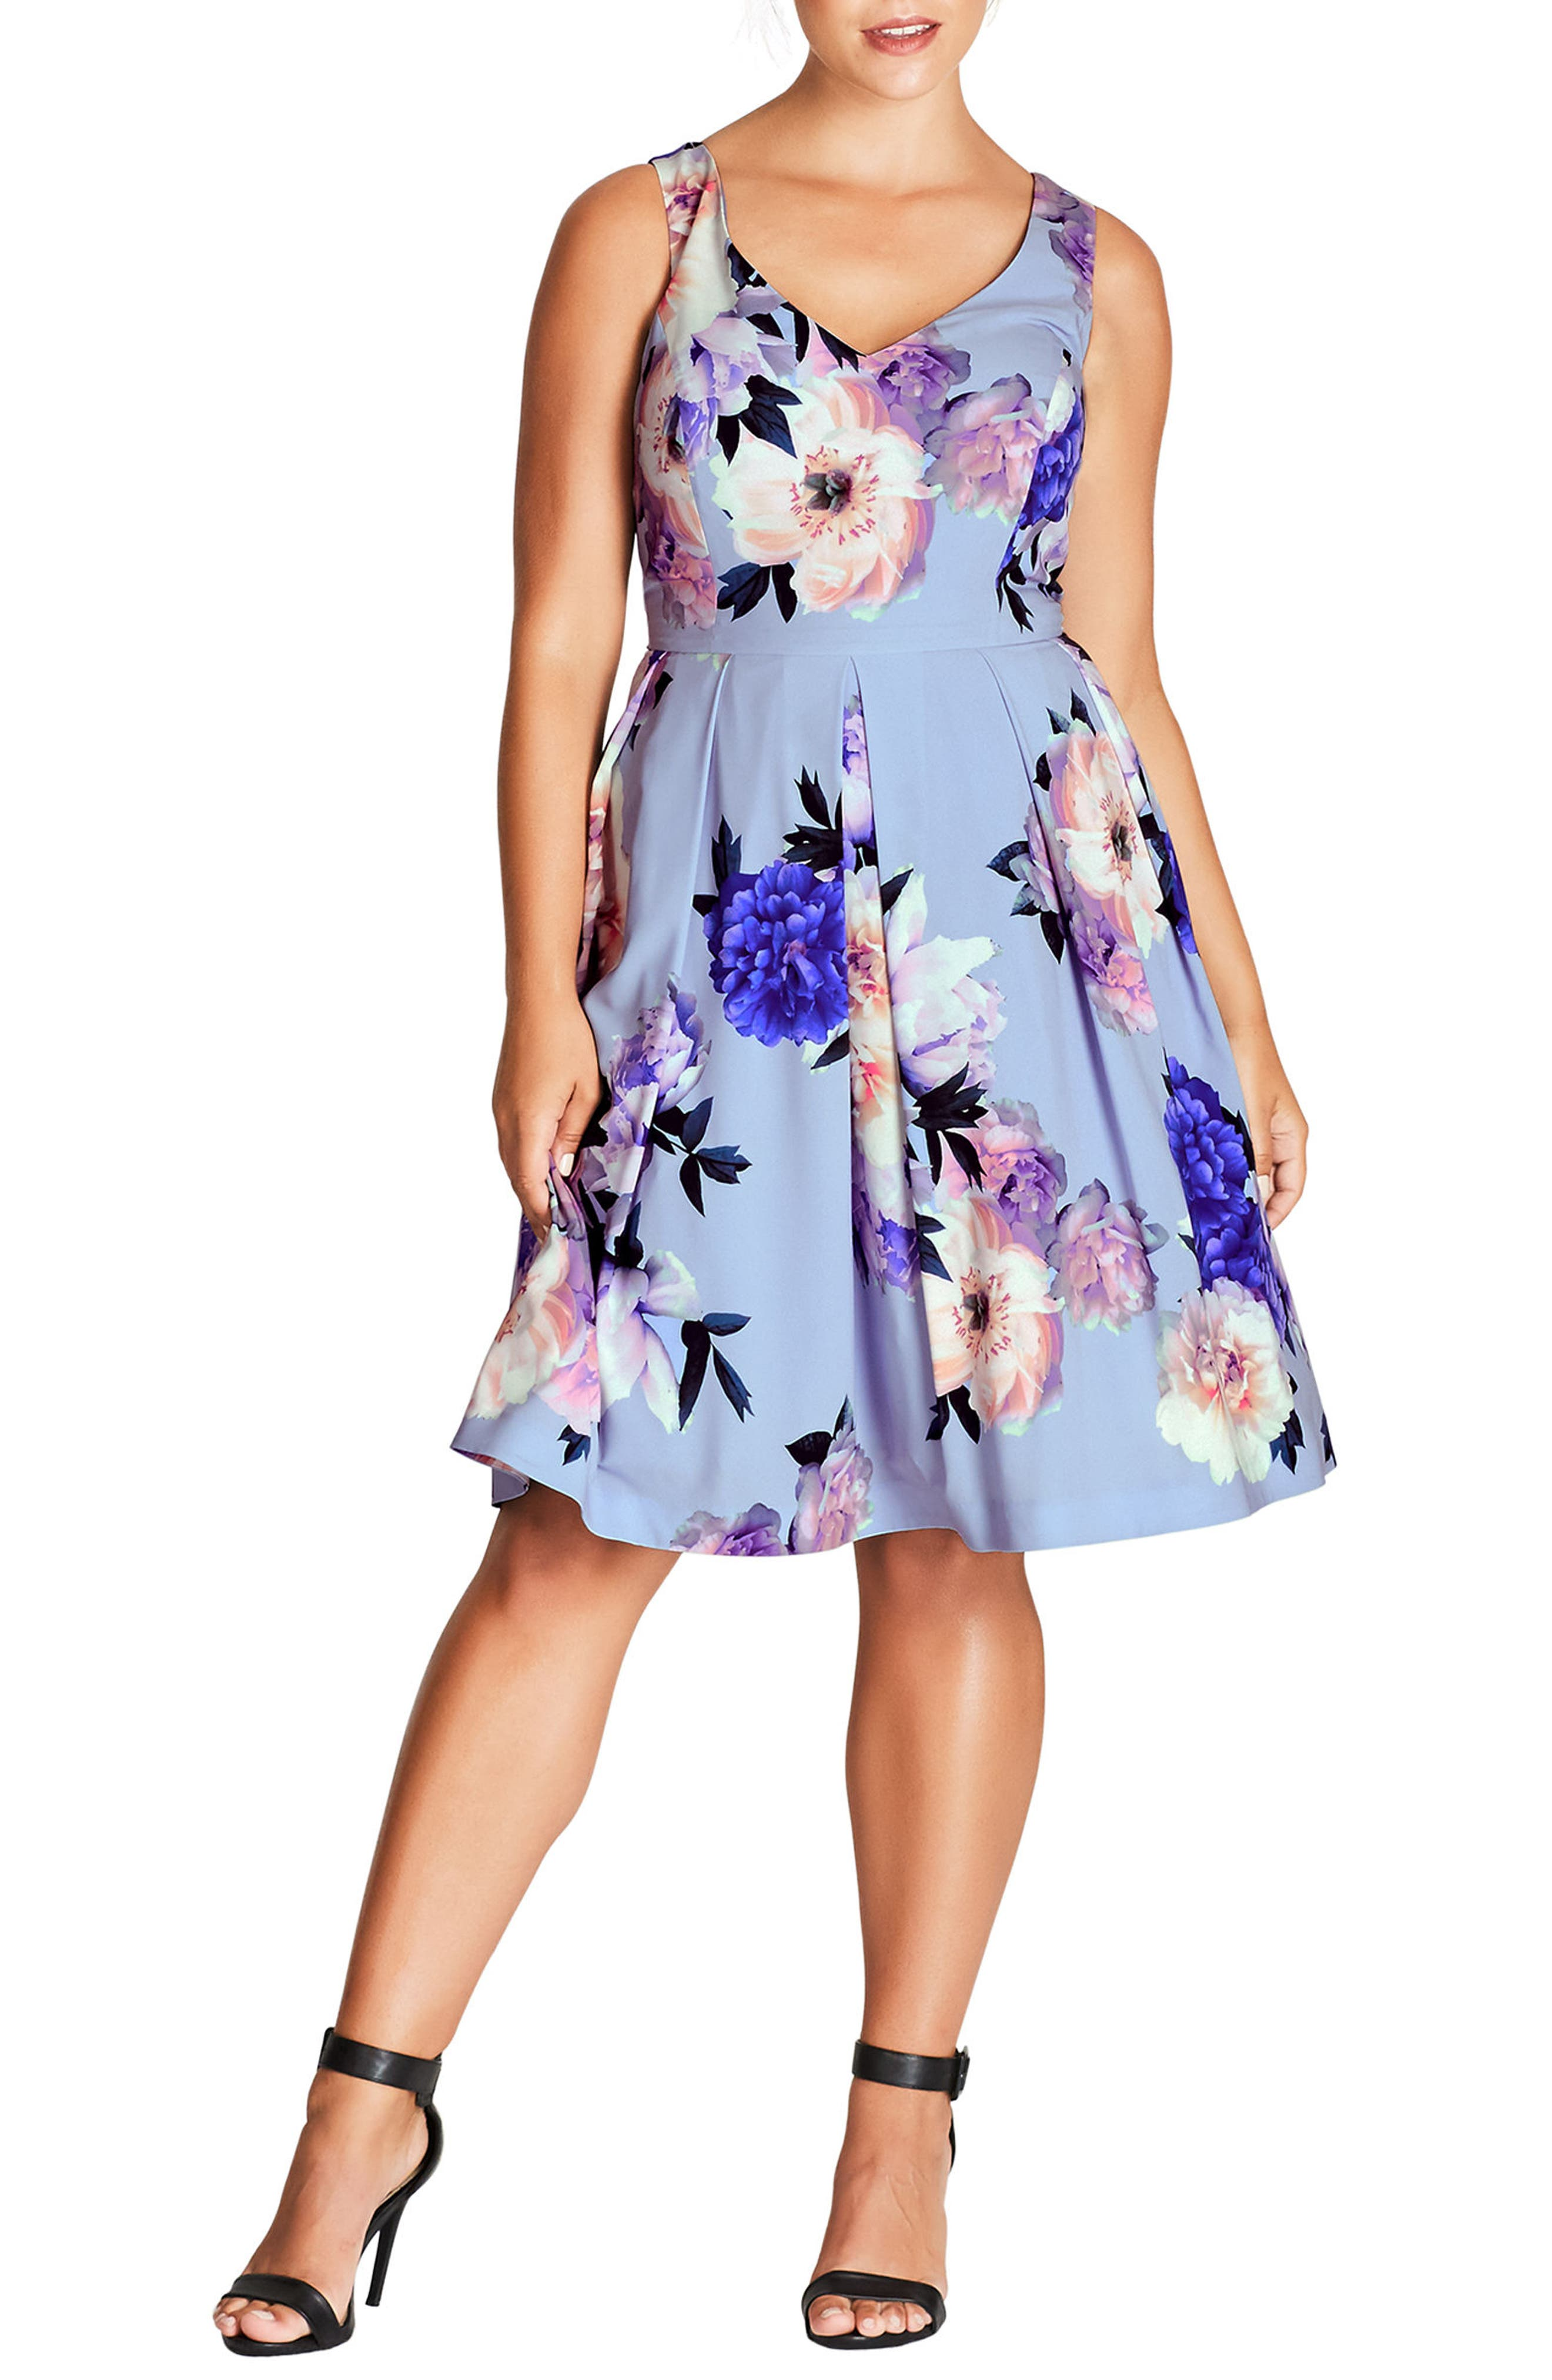 Main Image - City Chic Soft Blues Fit & Flare Dress (Plus Size)